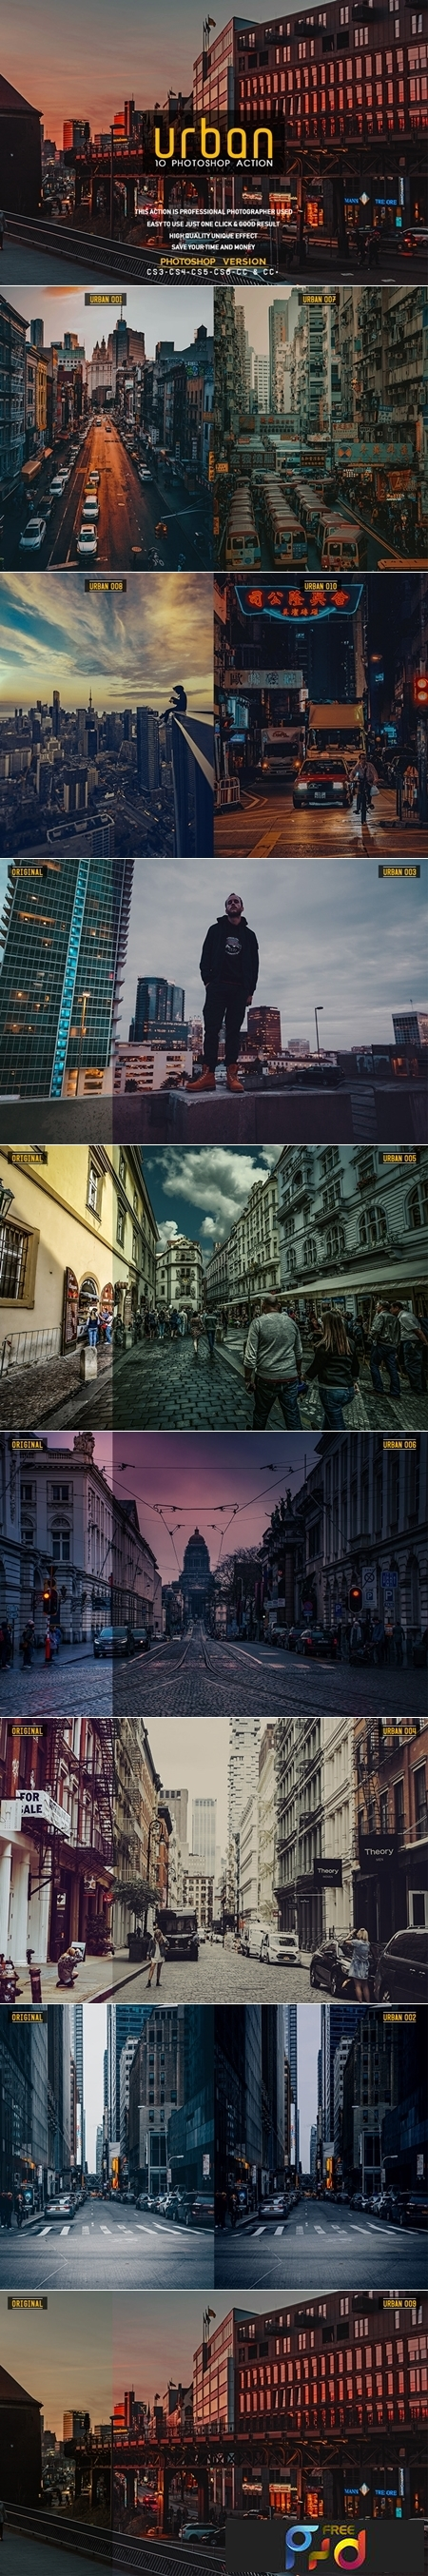 10 Urban Photoshop Action 3546196 1